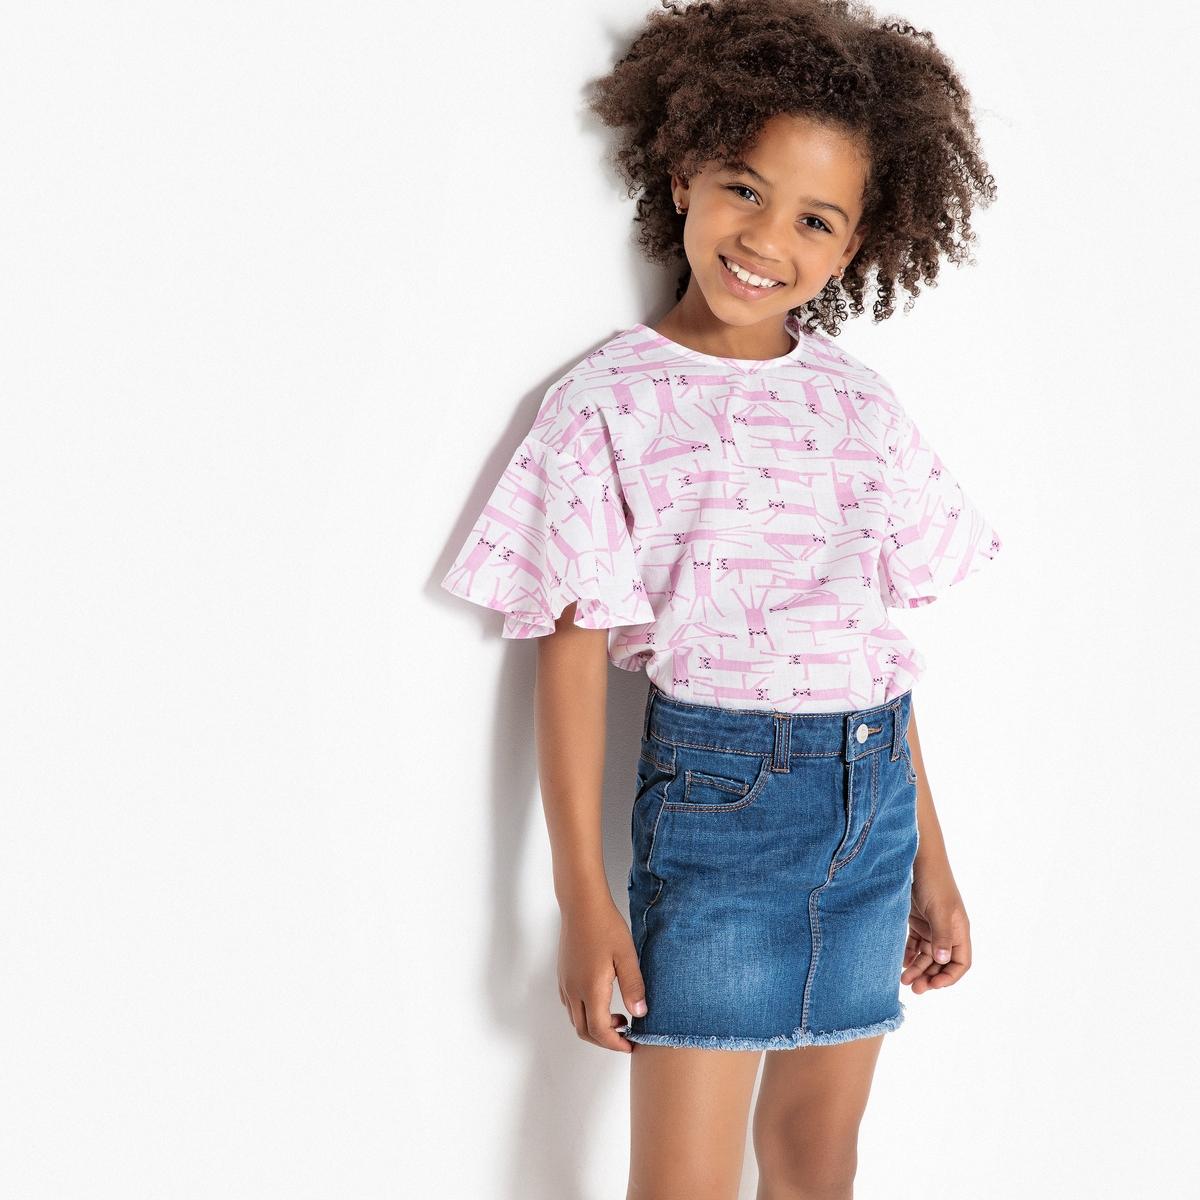 Блузка La Redoute С принтом кошки 12 лет -150 см другие пижама la redoute с шортами и цветочным принтом 12 лет 150 см другие